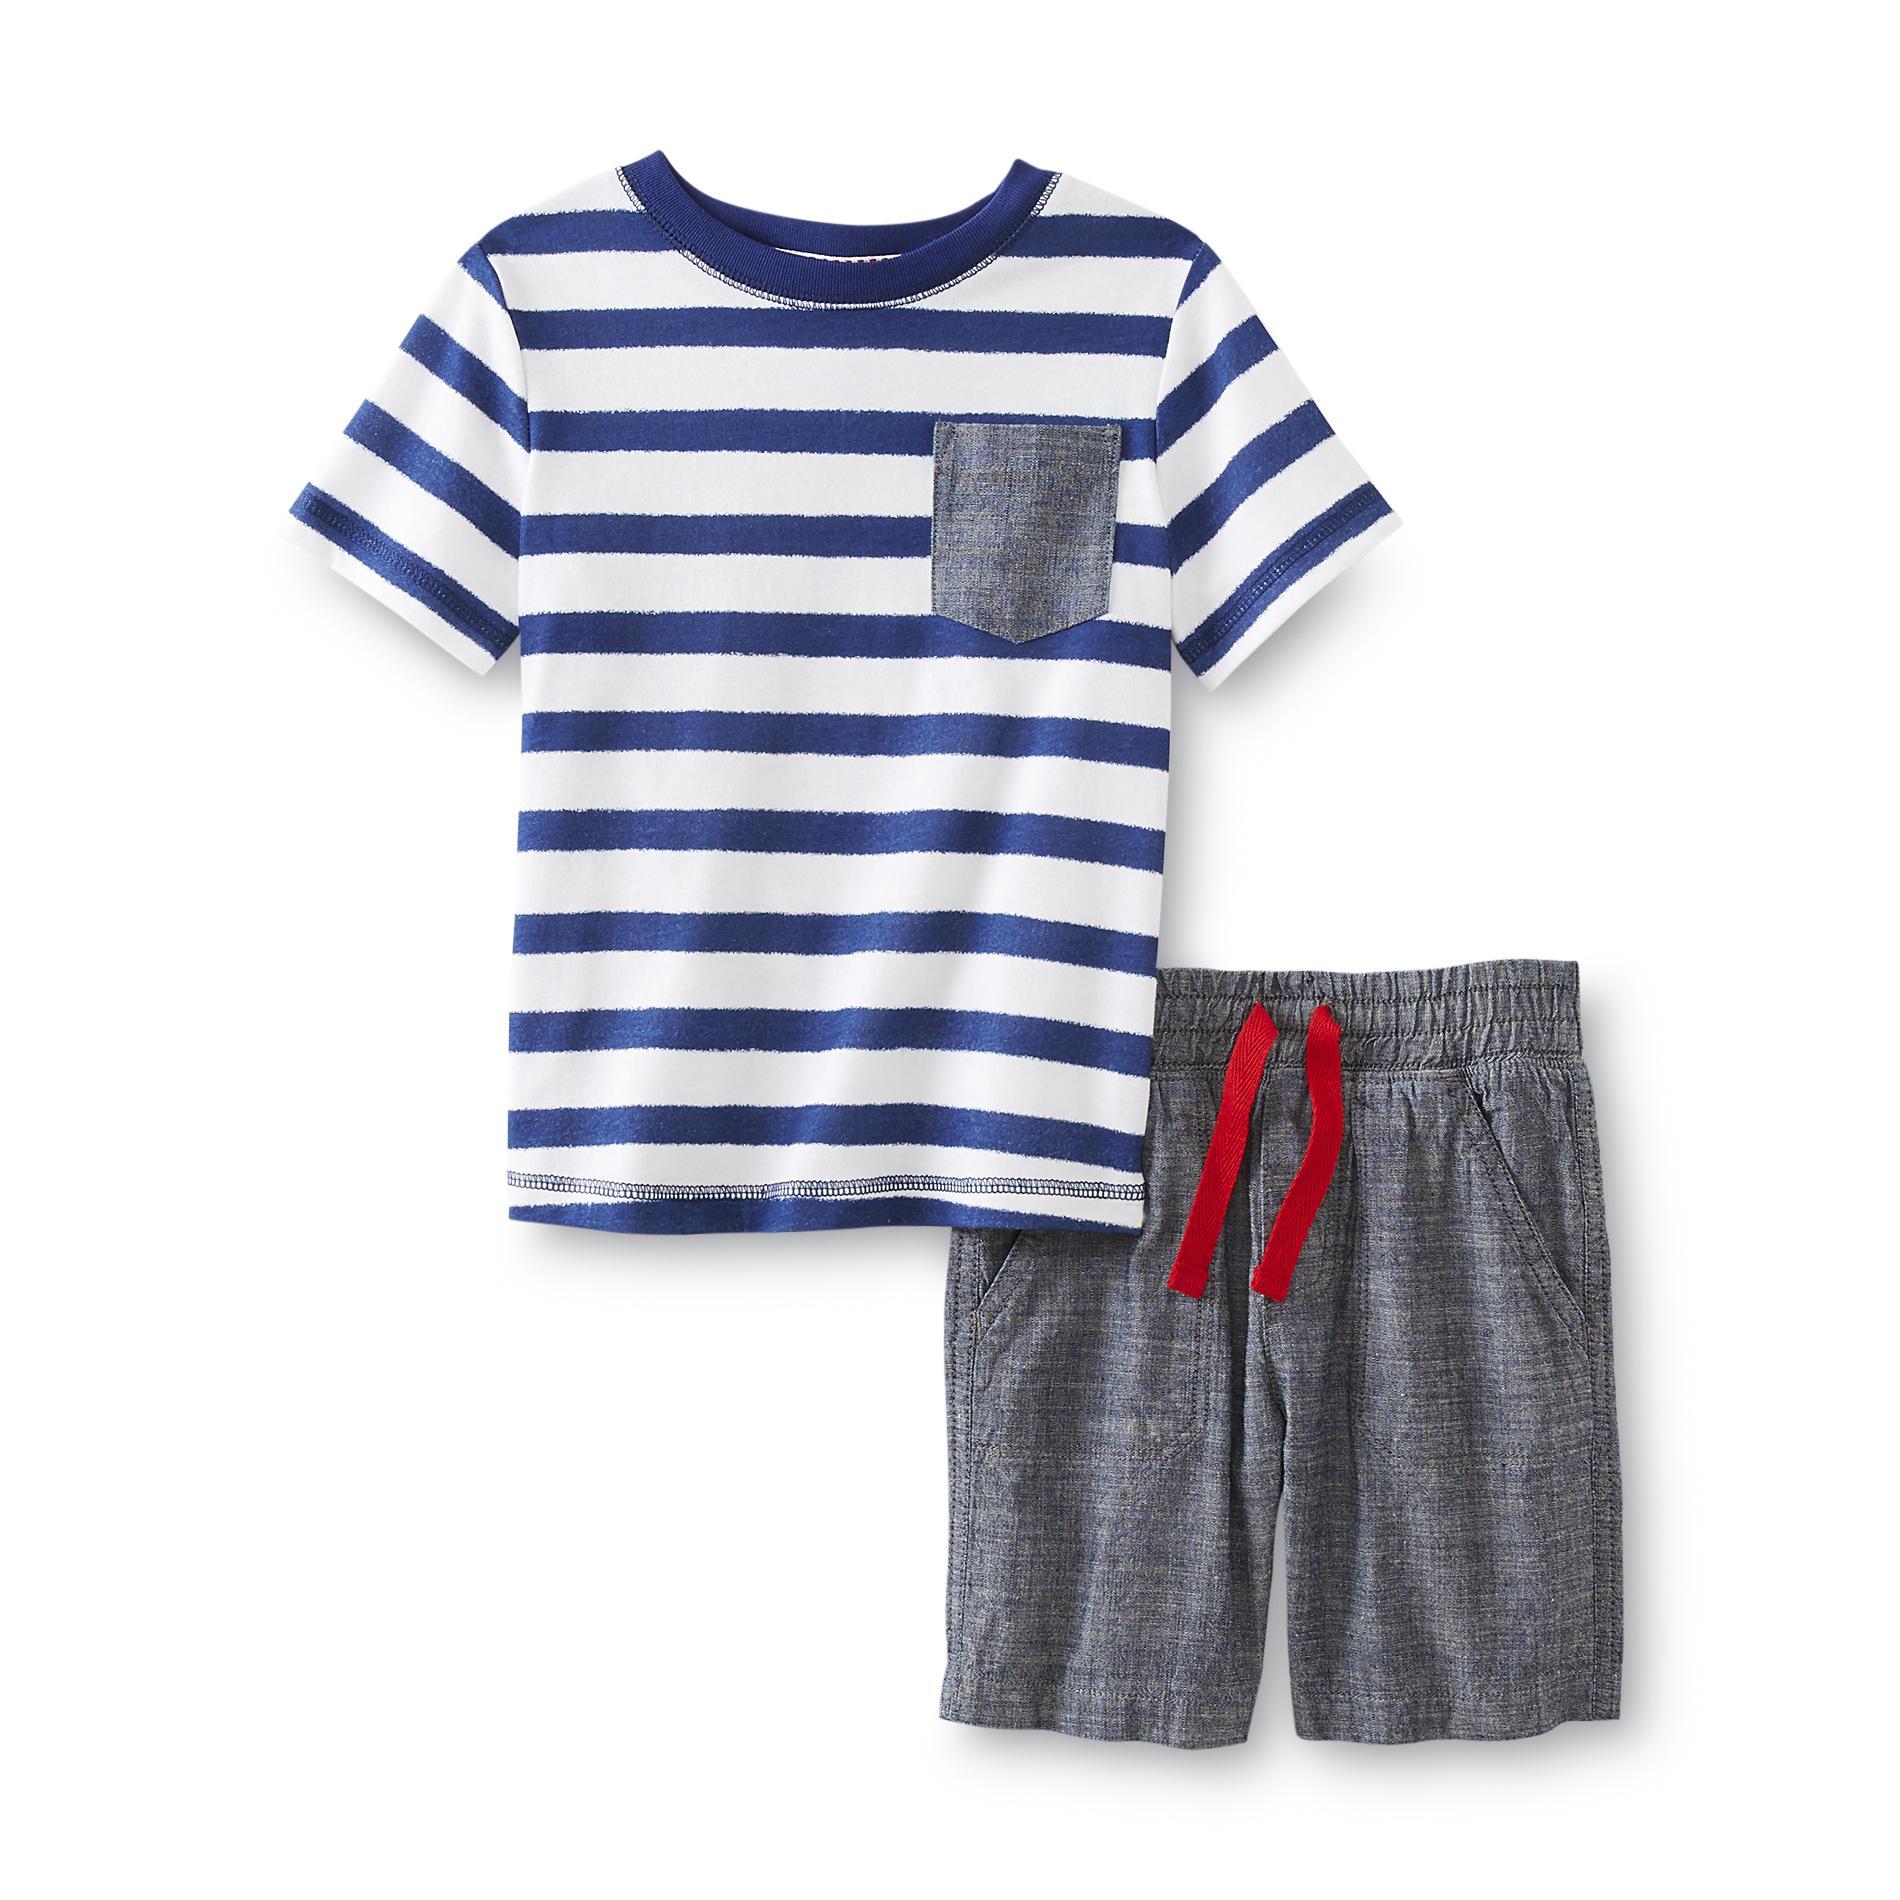 WonderKids Infant & Toddler Boy's Pocket T-Shirt & Chambray Shorts - Striped